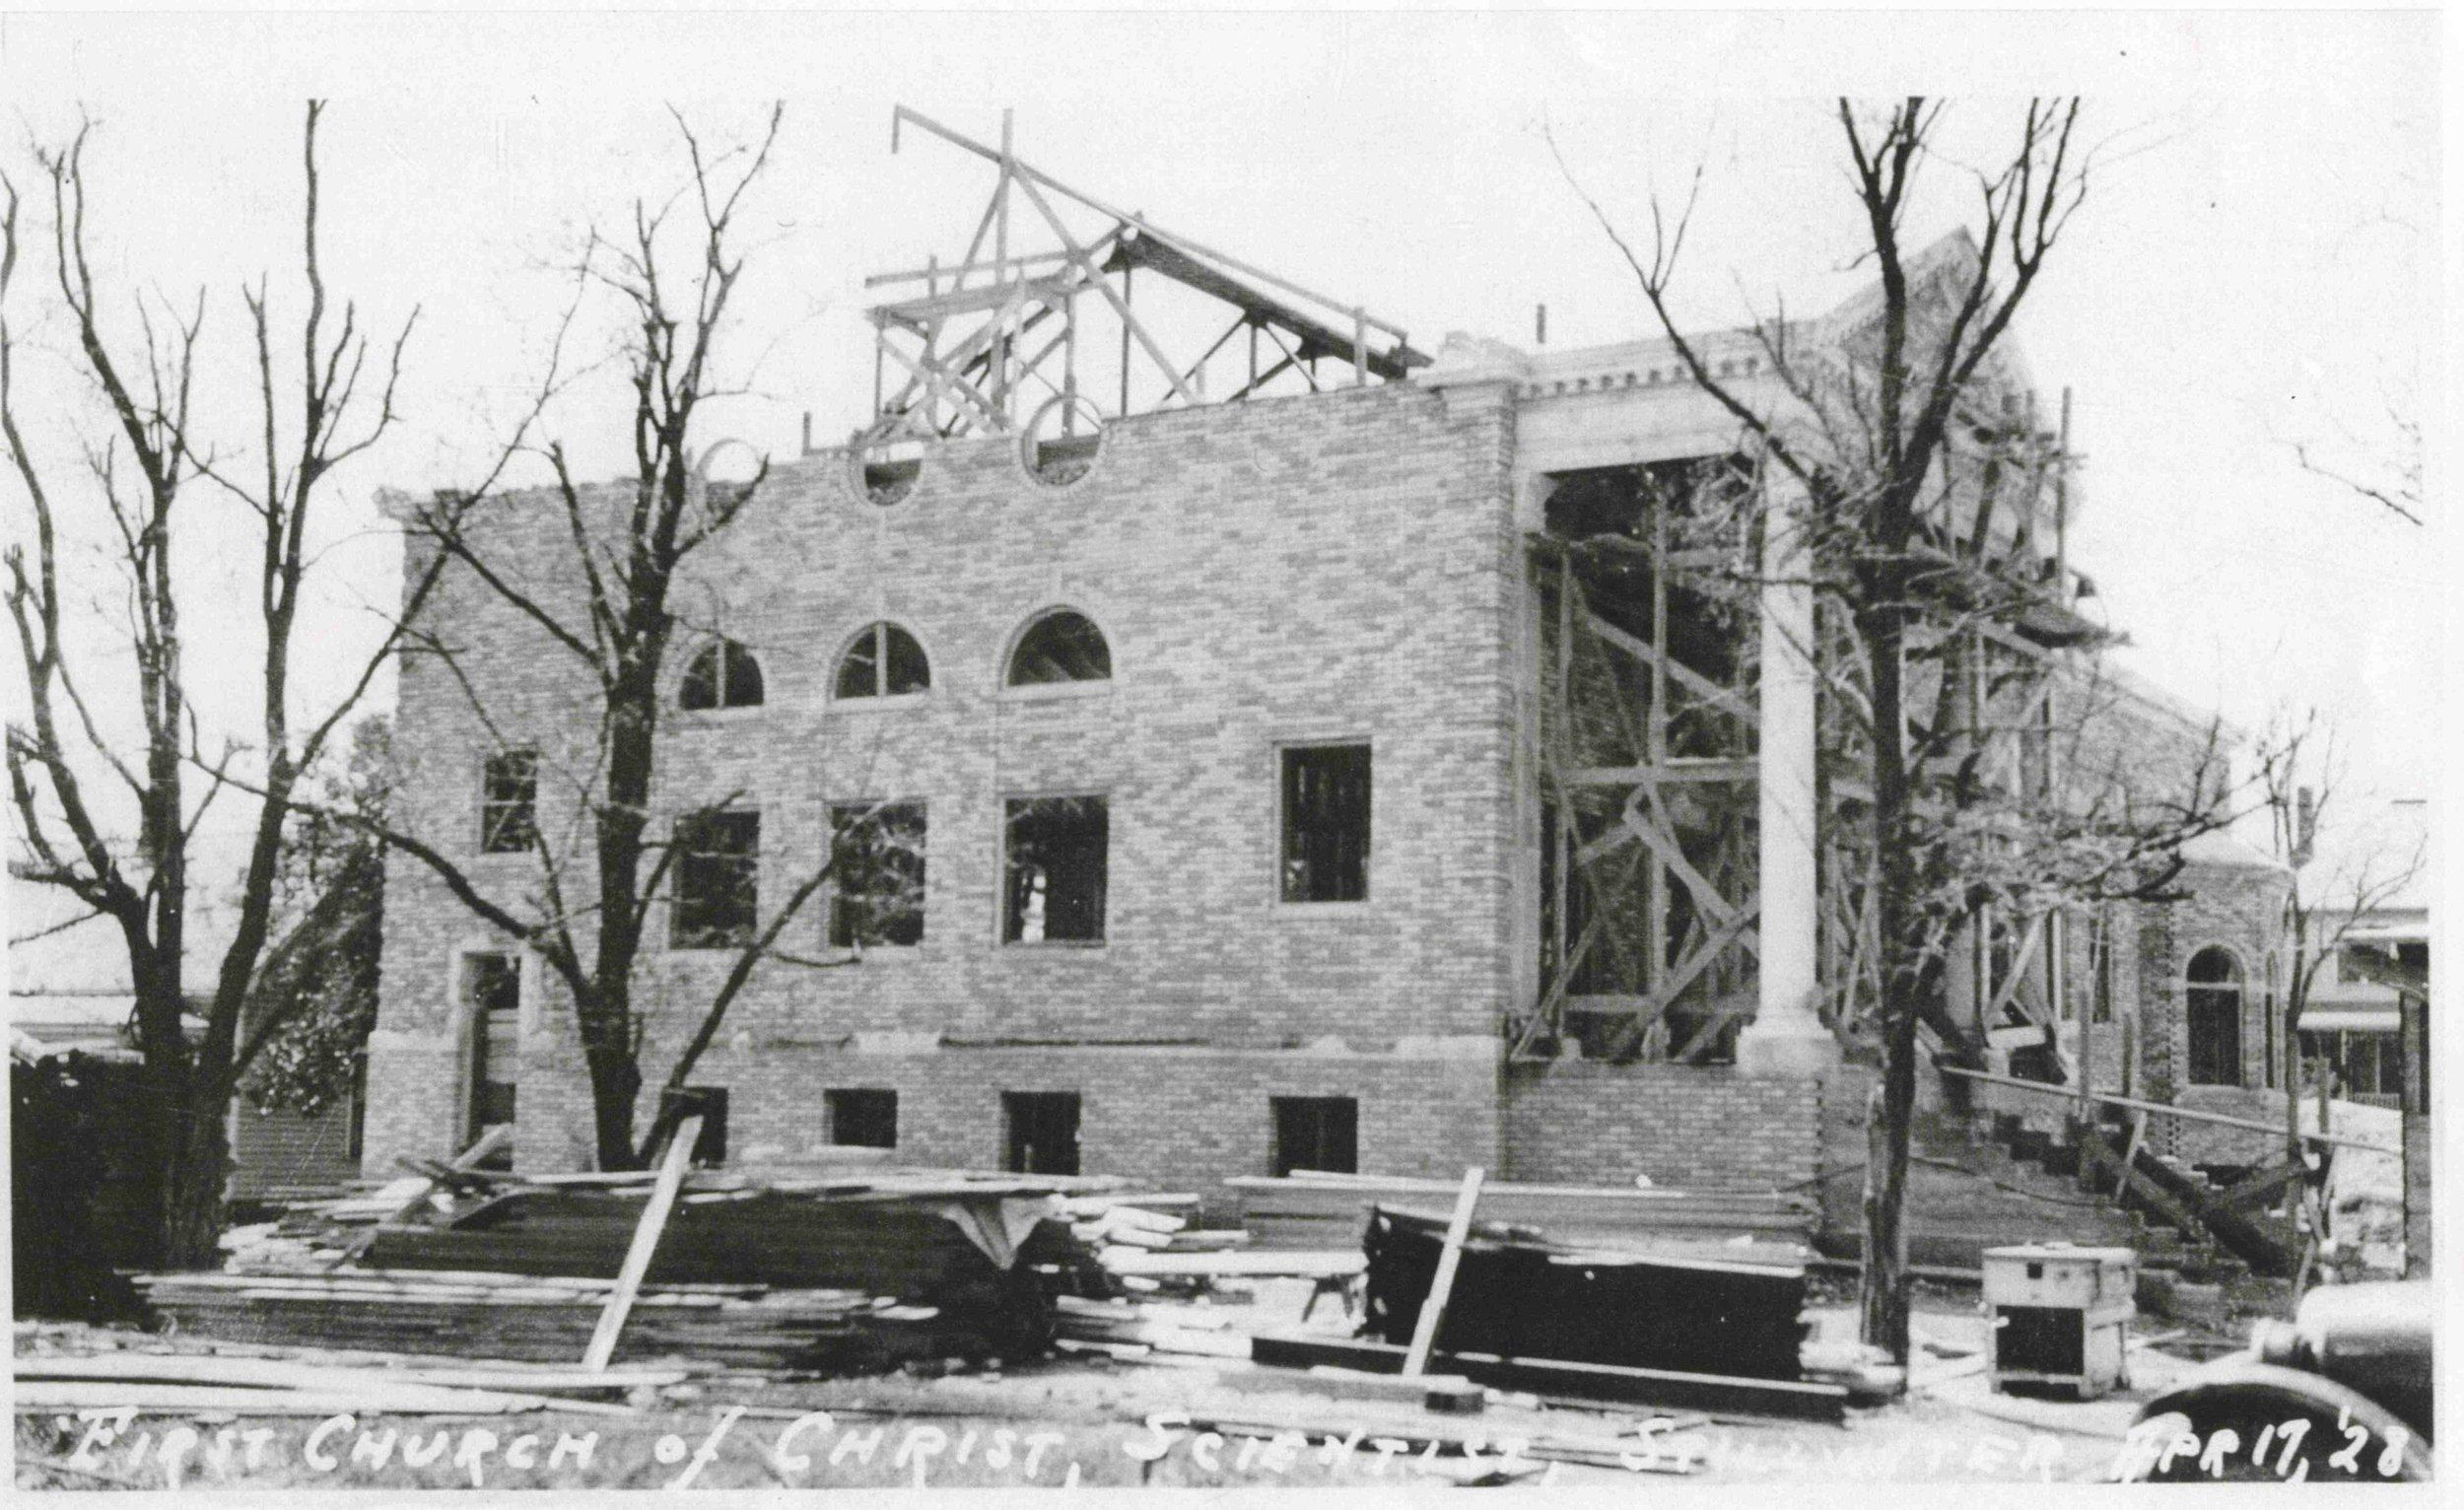 1928 Building Construction